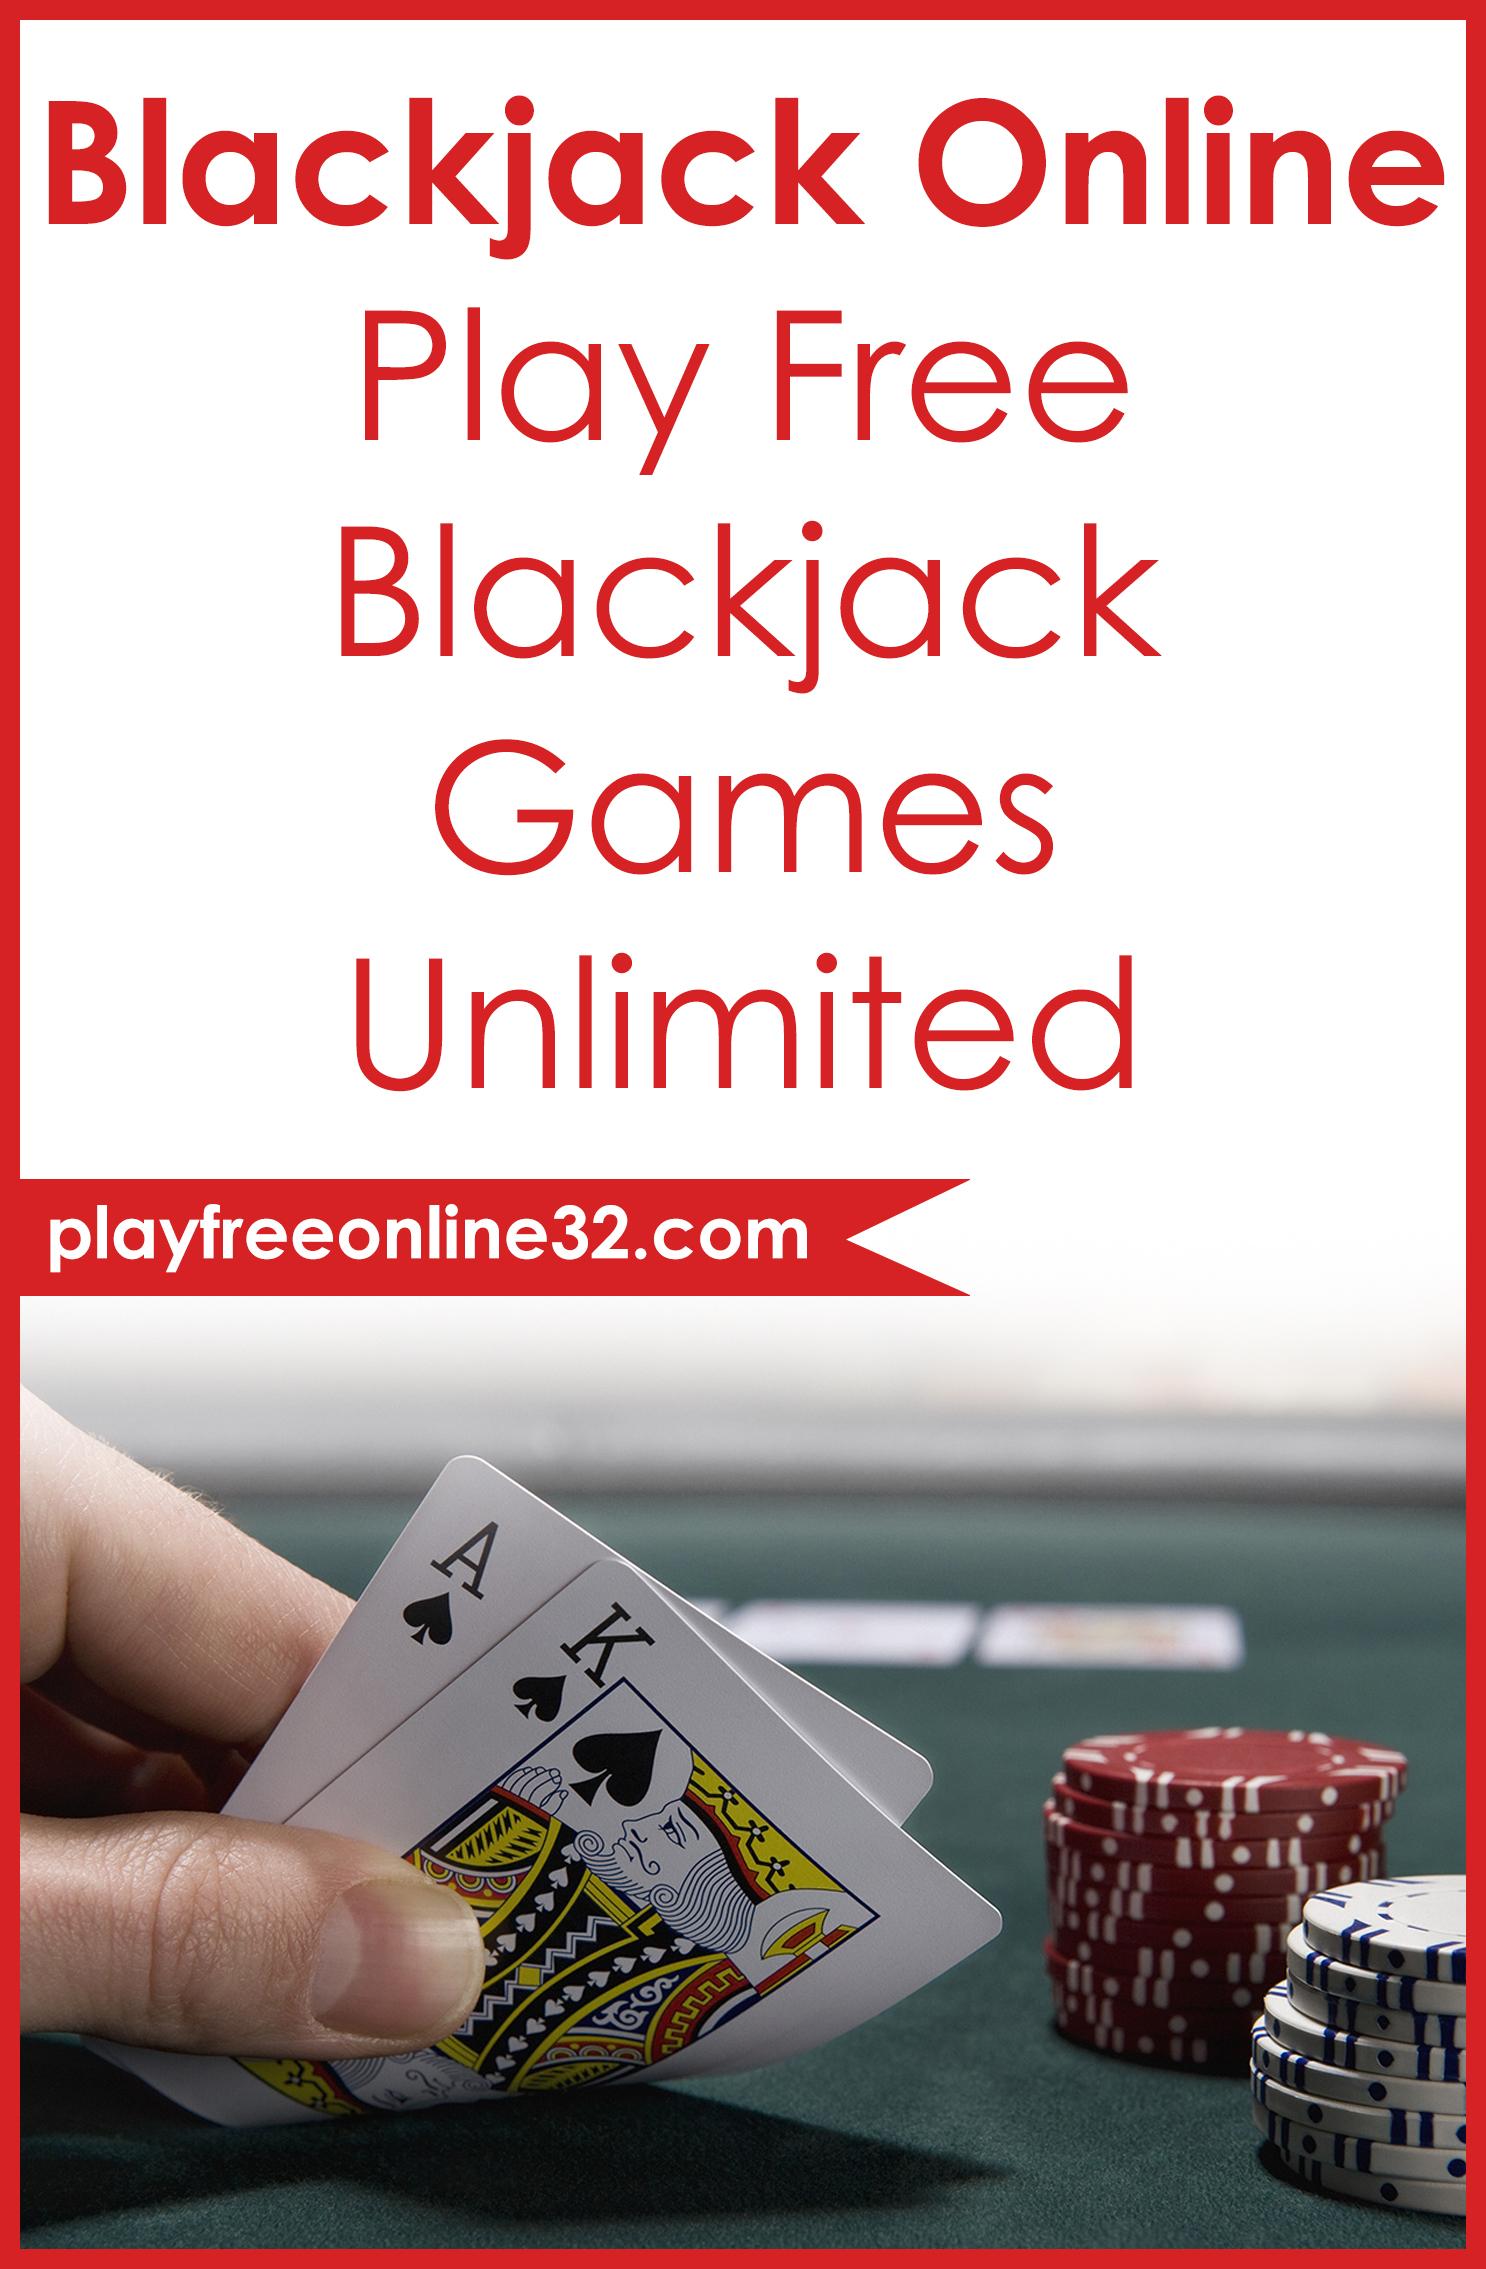 Blackjack Online • Play Free Blackjack Games Unlimited Pinterest